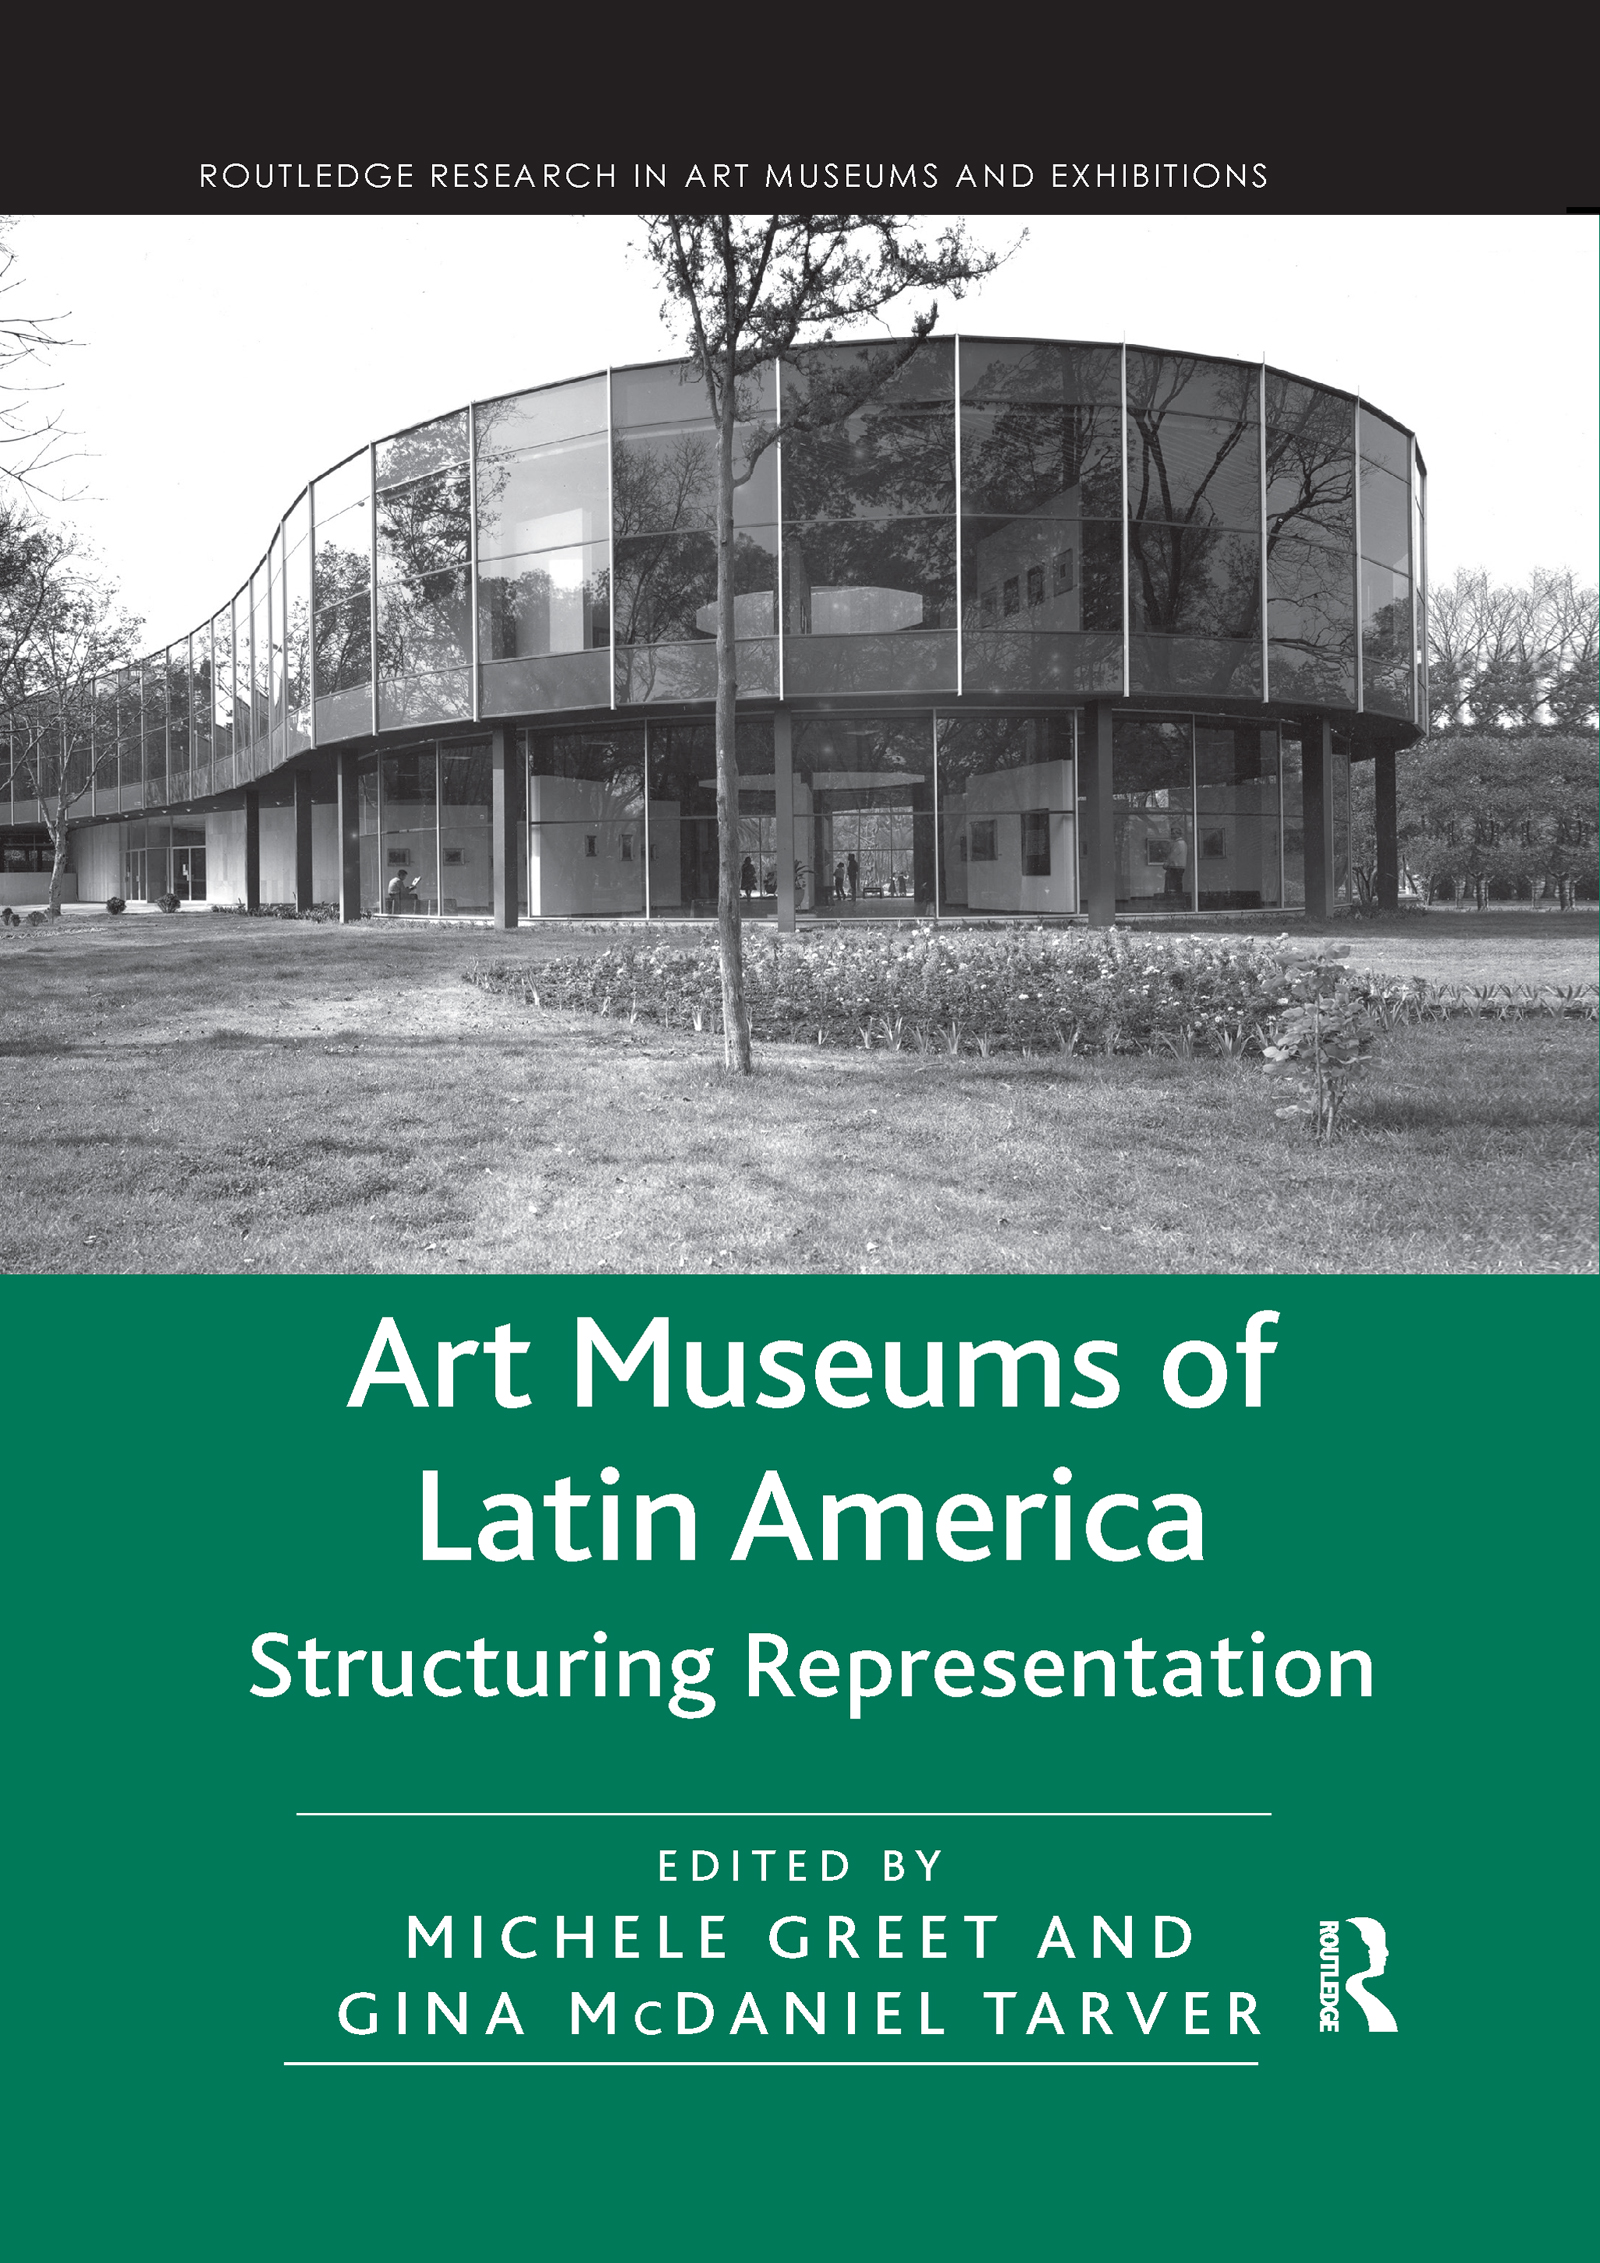 Art Museums of Latin America